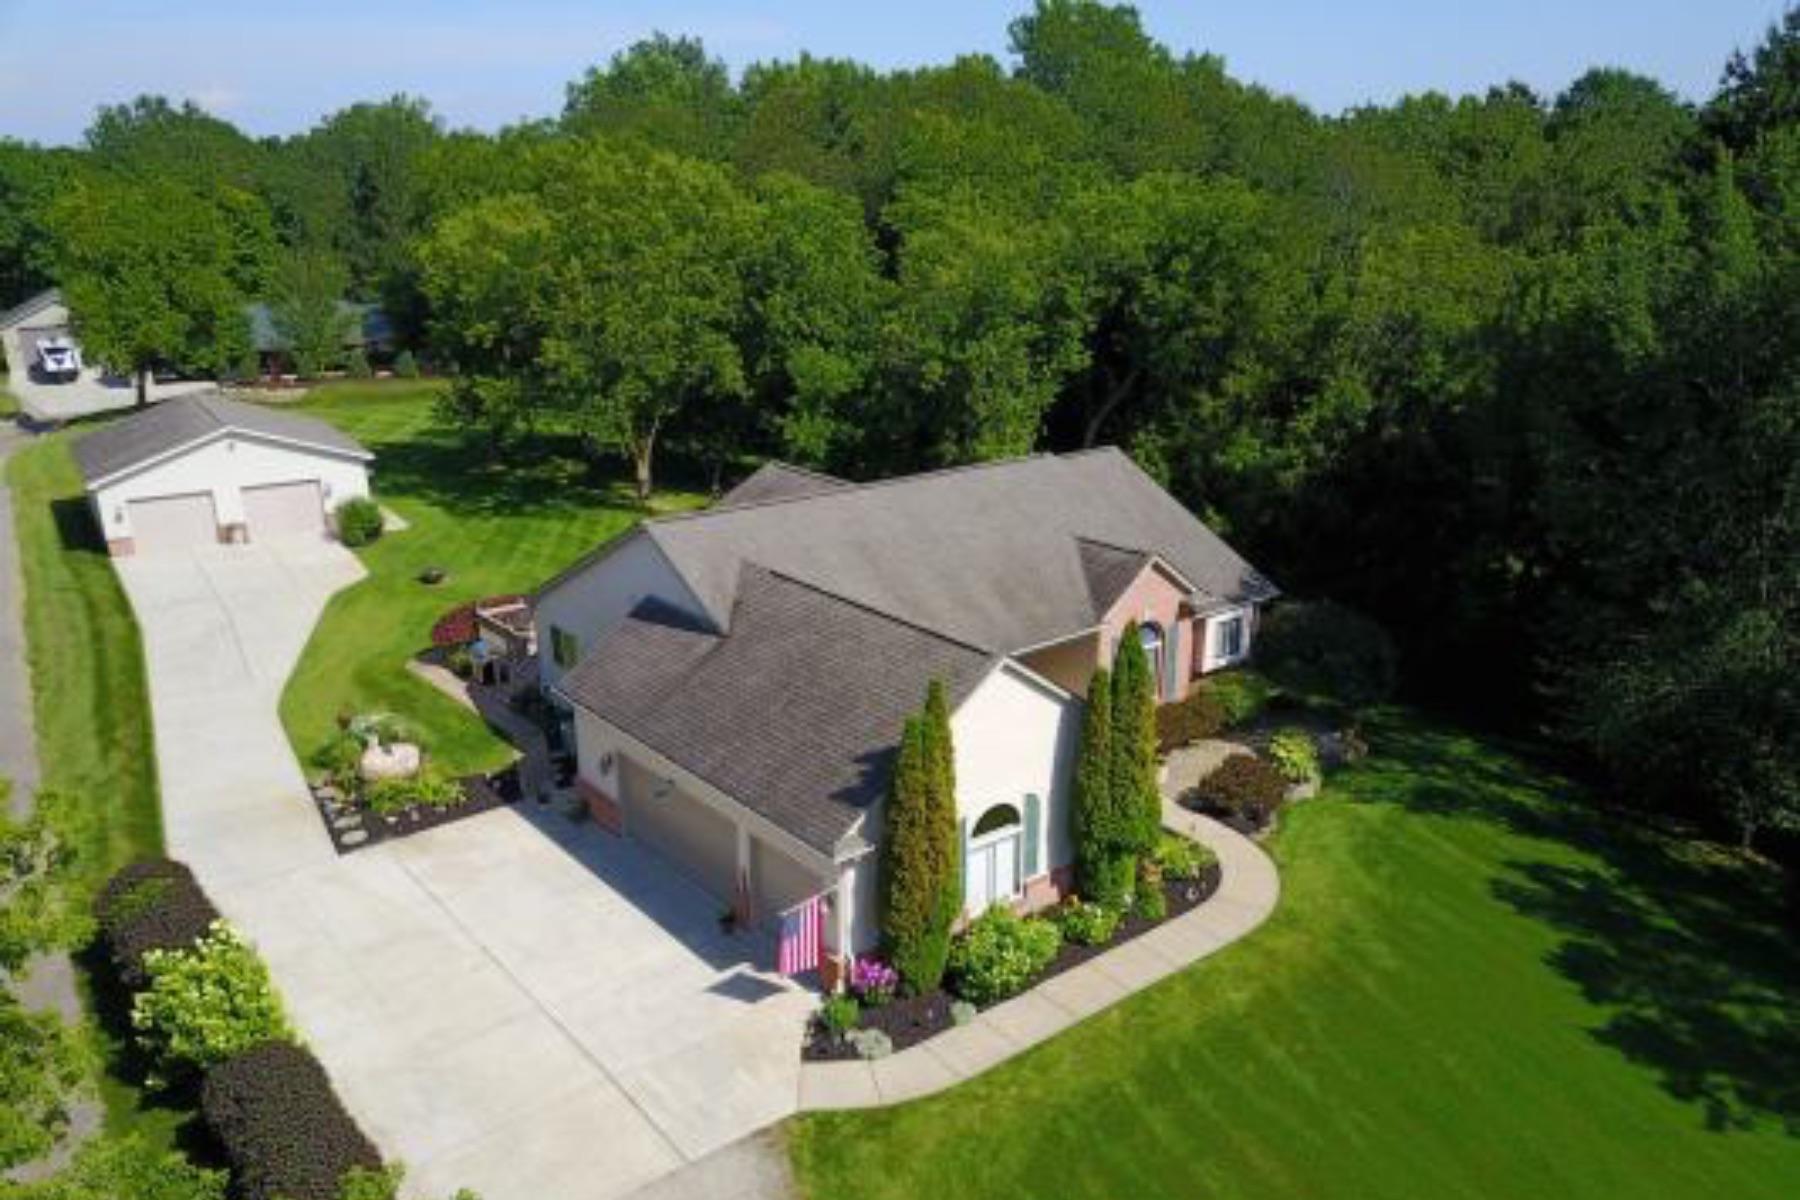 Single Family Homes for Active at Brandon Twp 2871 S Hadley Rd Brandon, Michigan 48462 United States